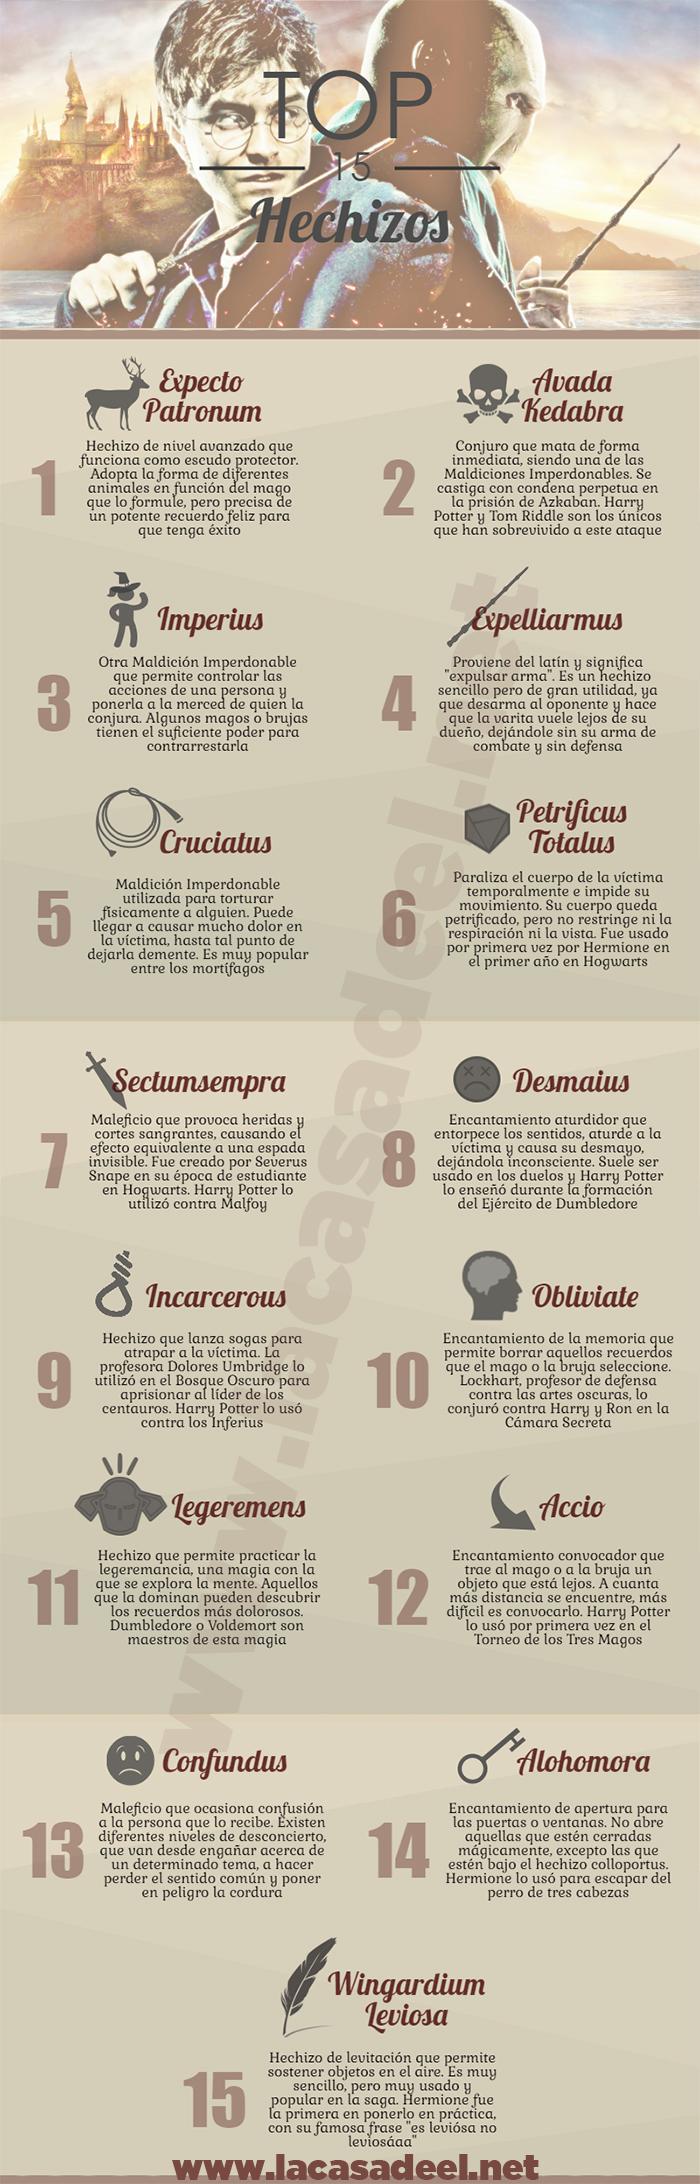 Infografía top 15 hechizos Harry Potter